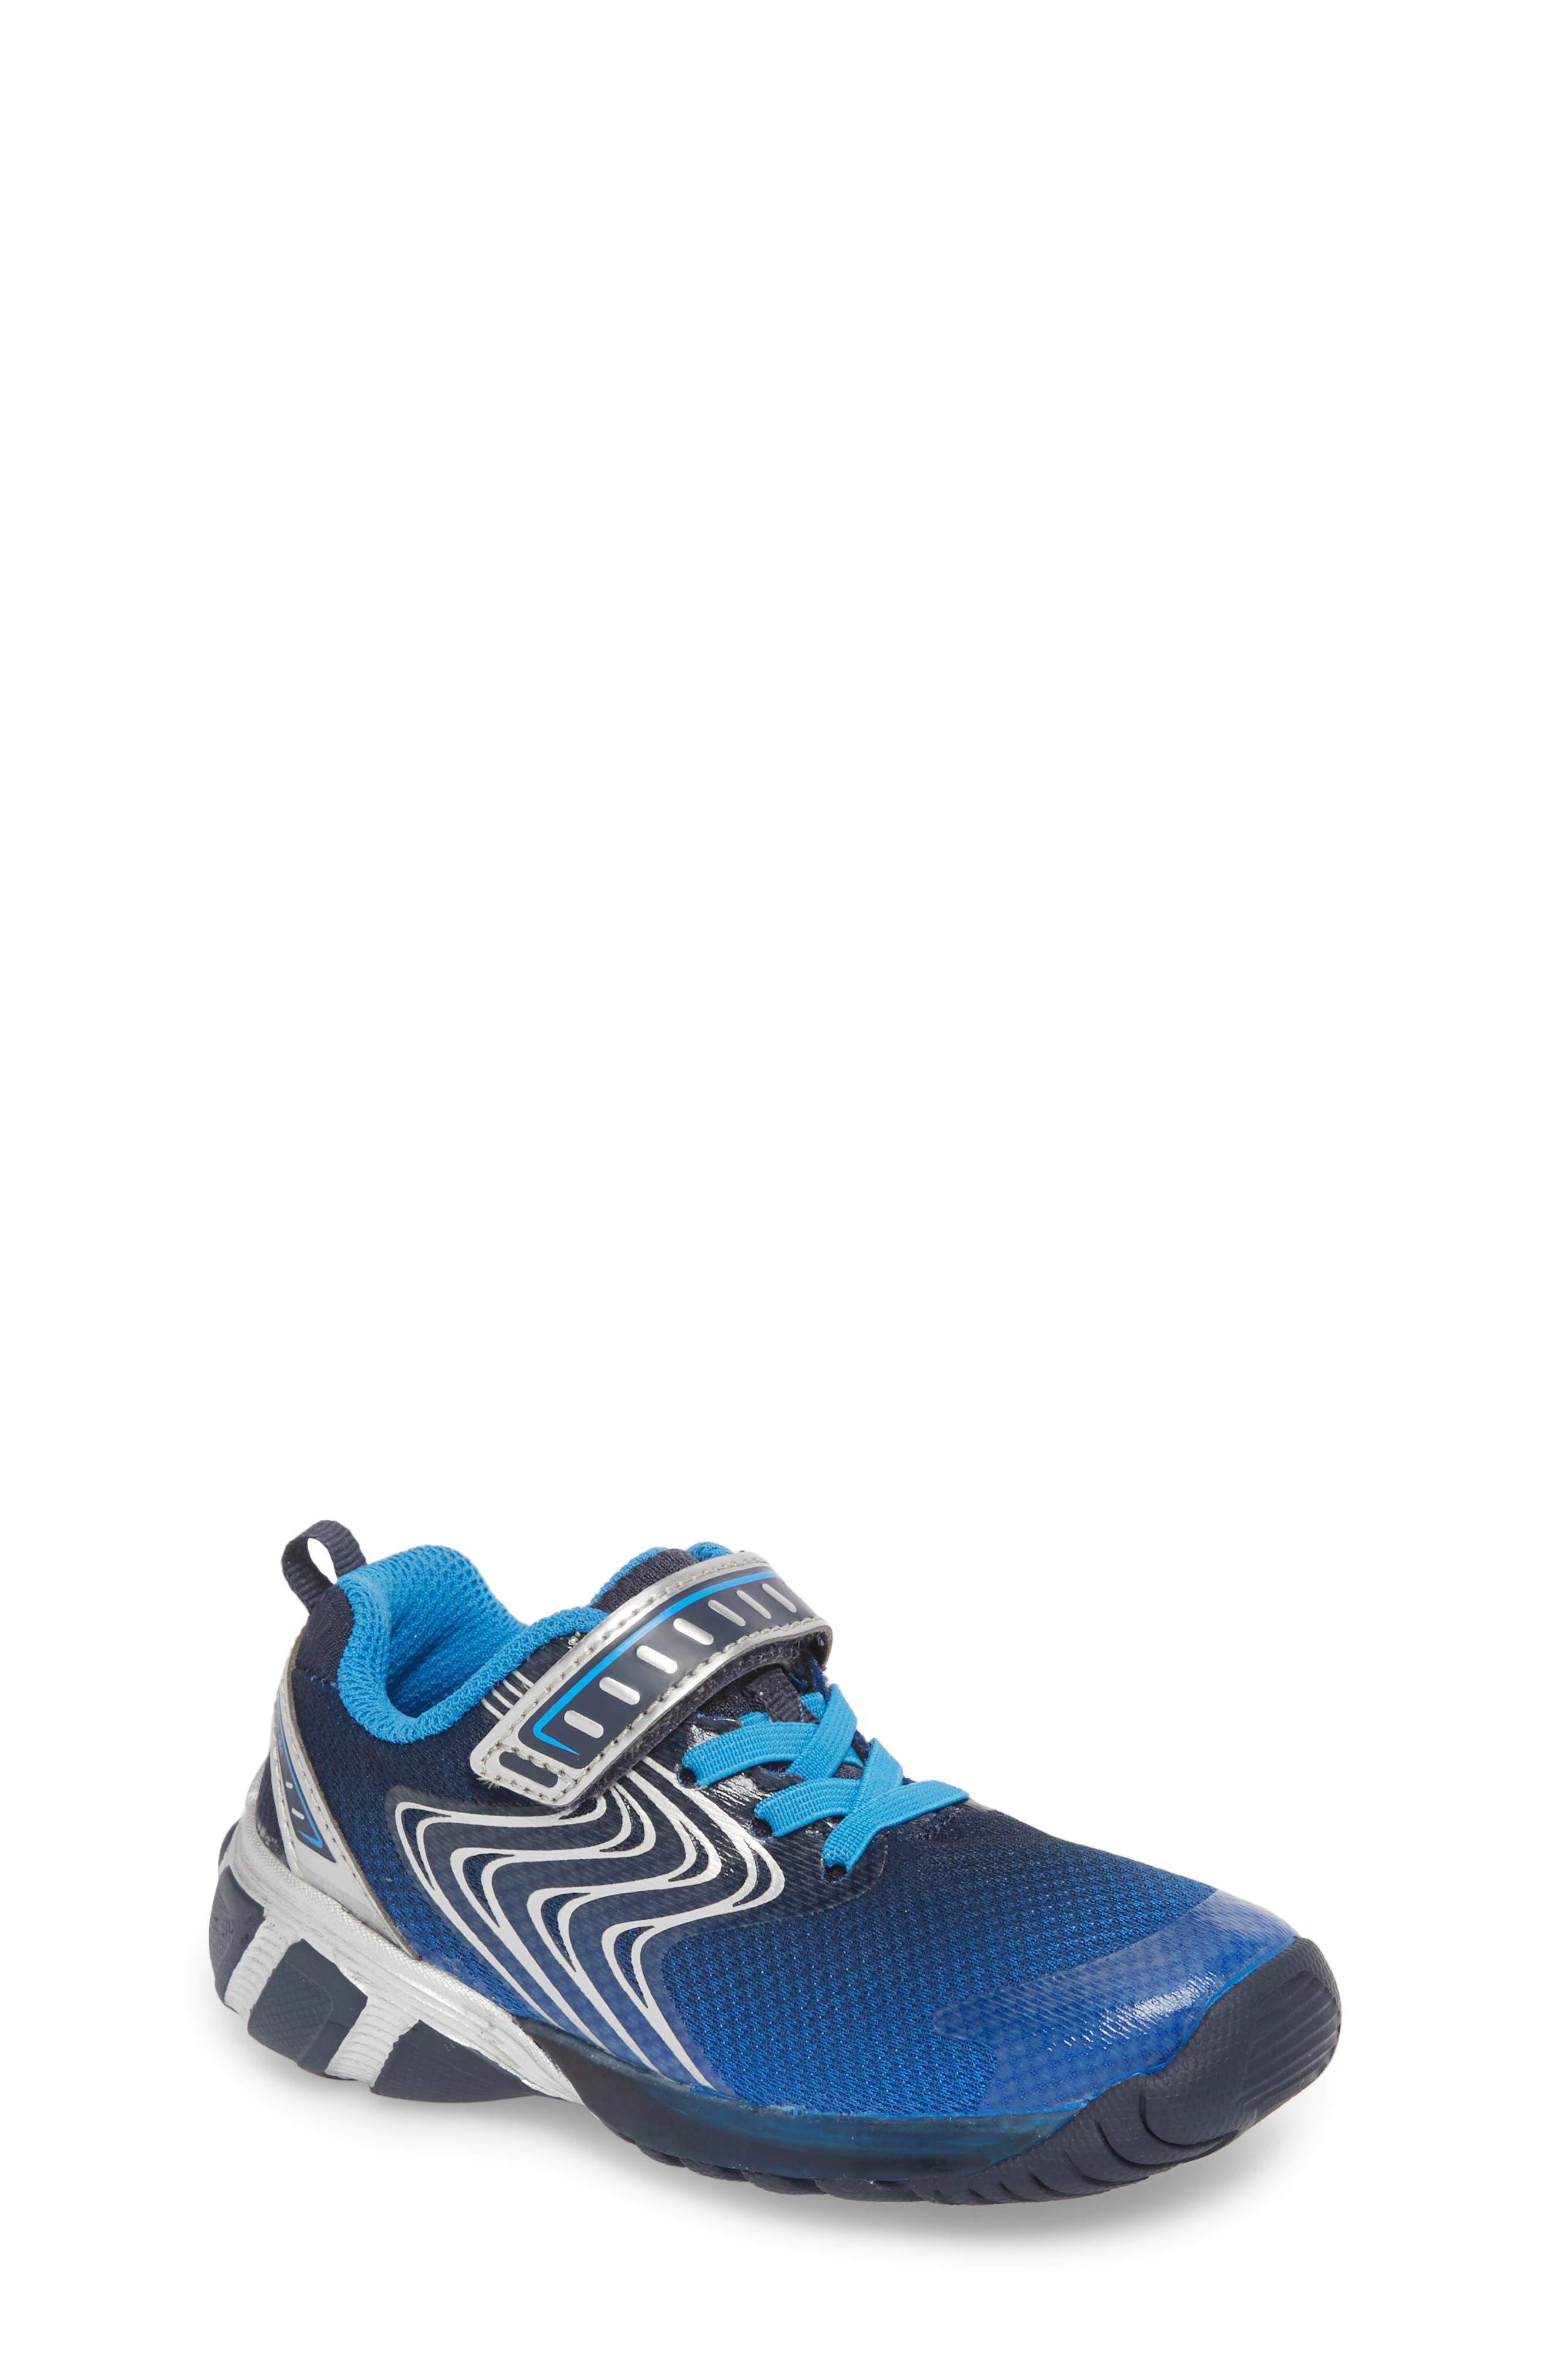 Main Image - Stride Rite Lights Lux Light-Up Sneaker (Walker &Toddler)